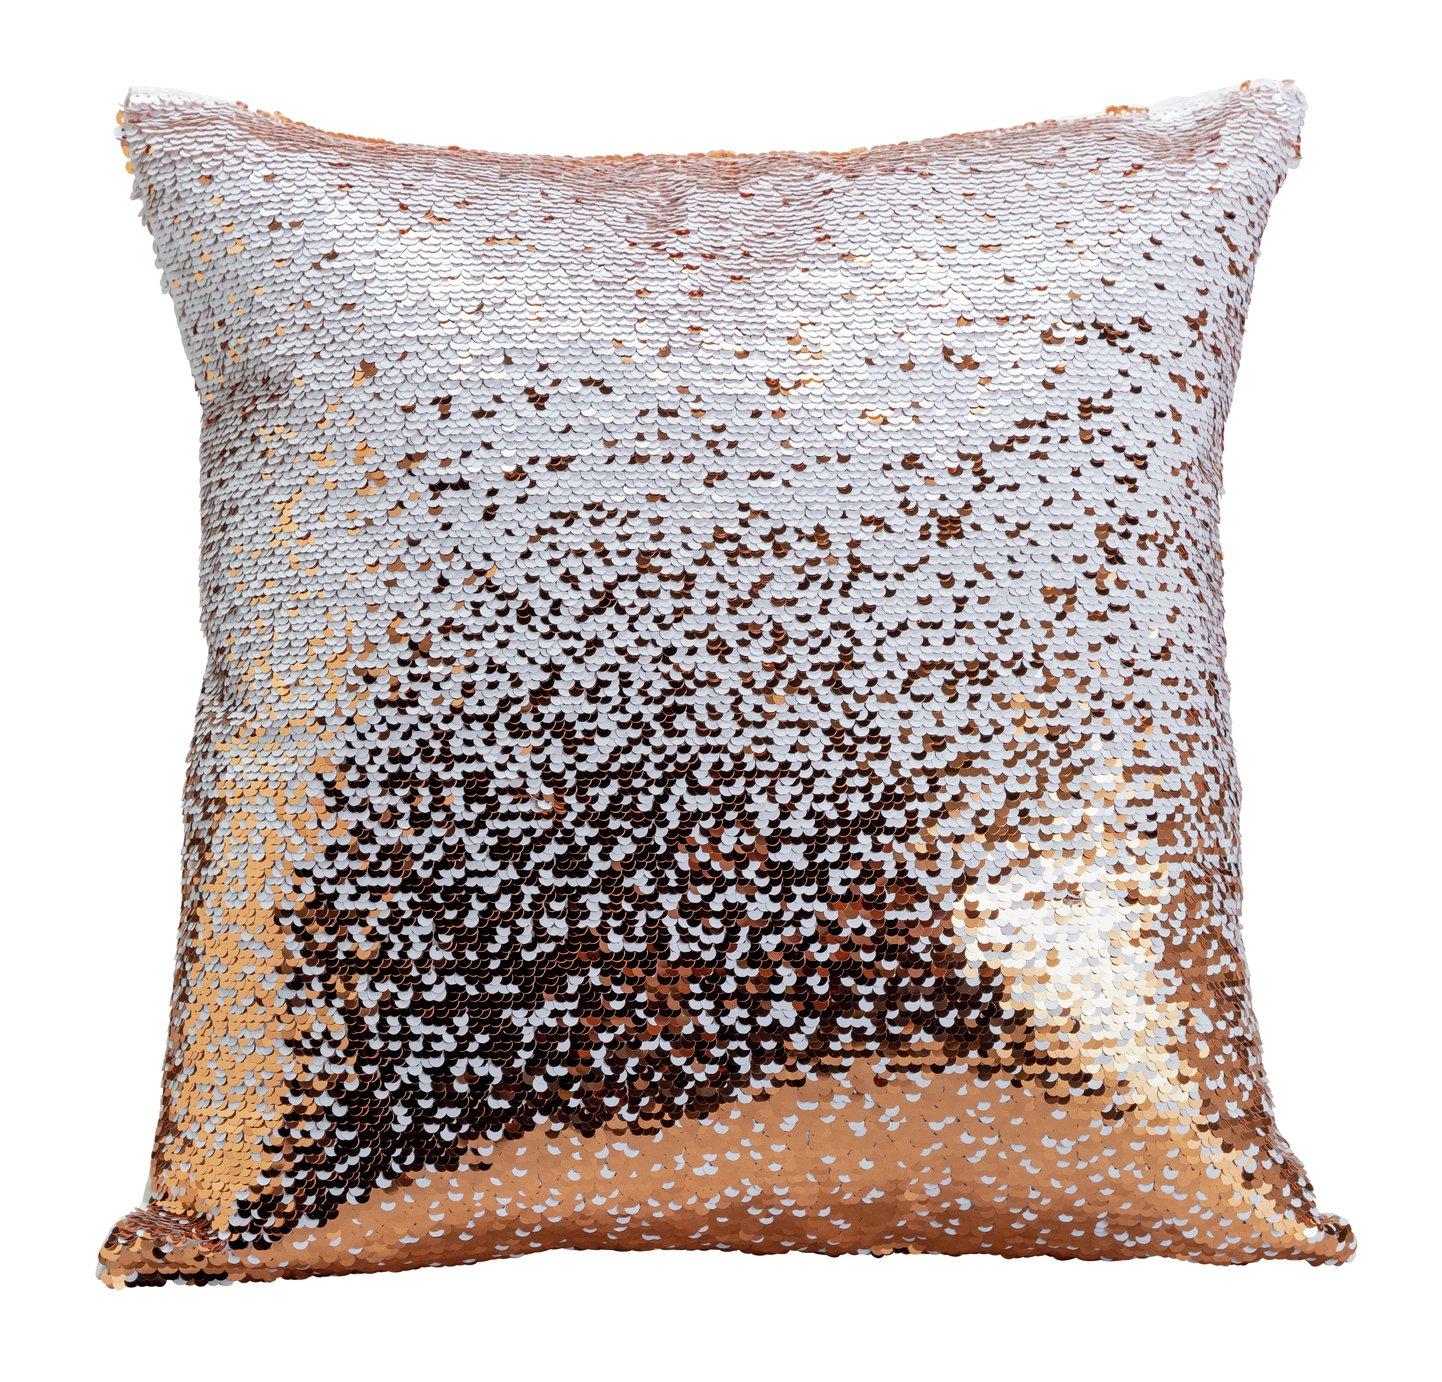 Argos Home Sequin Cushion - Black & Pink